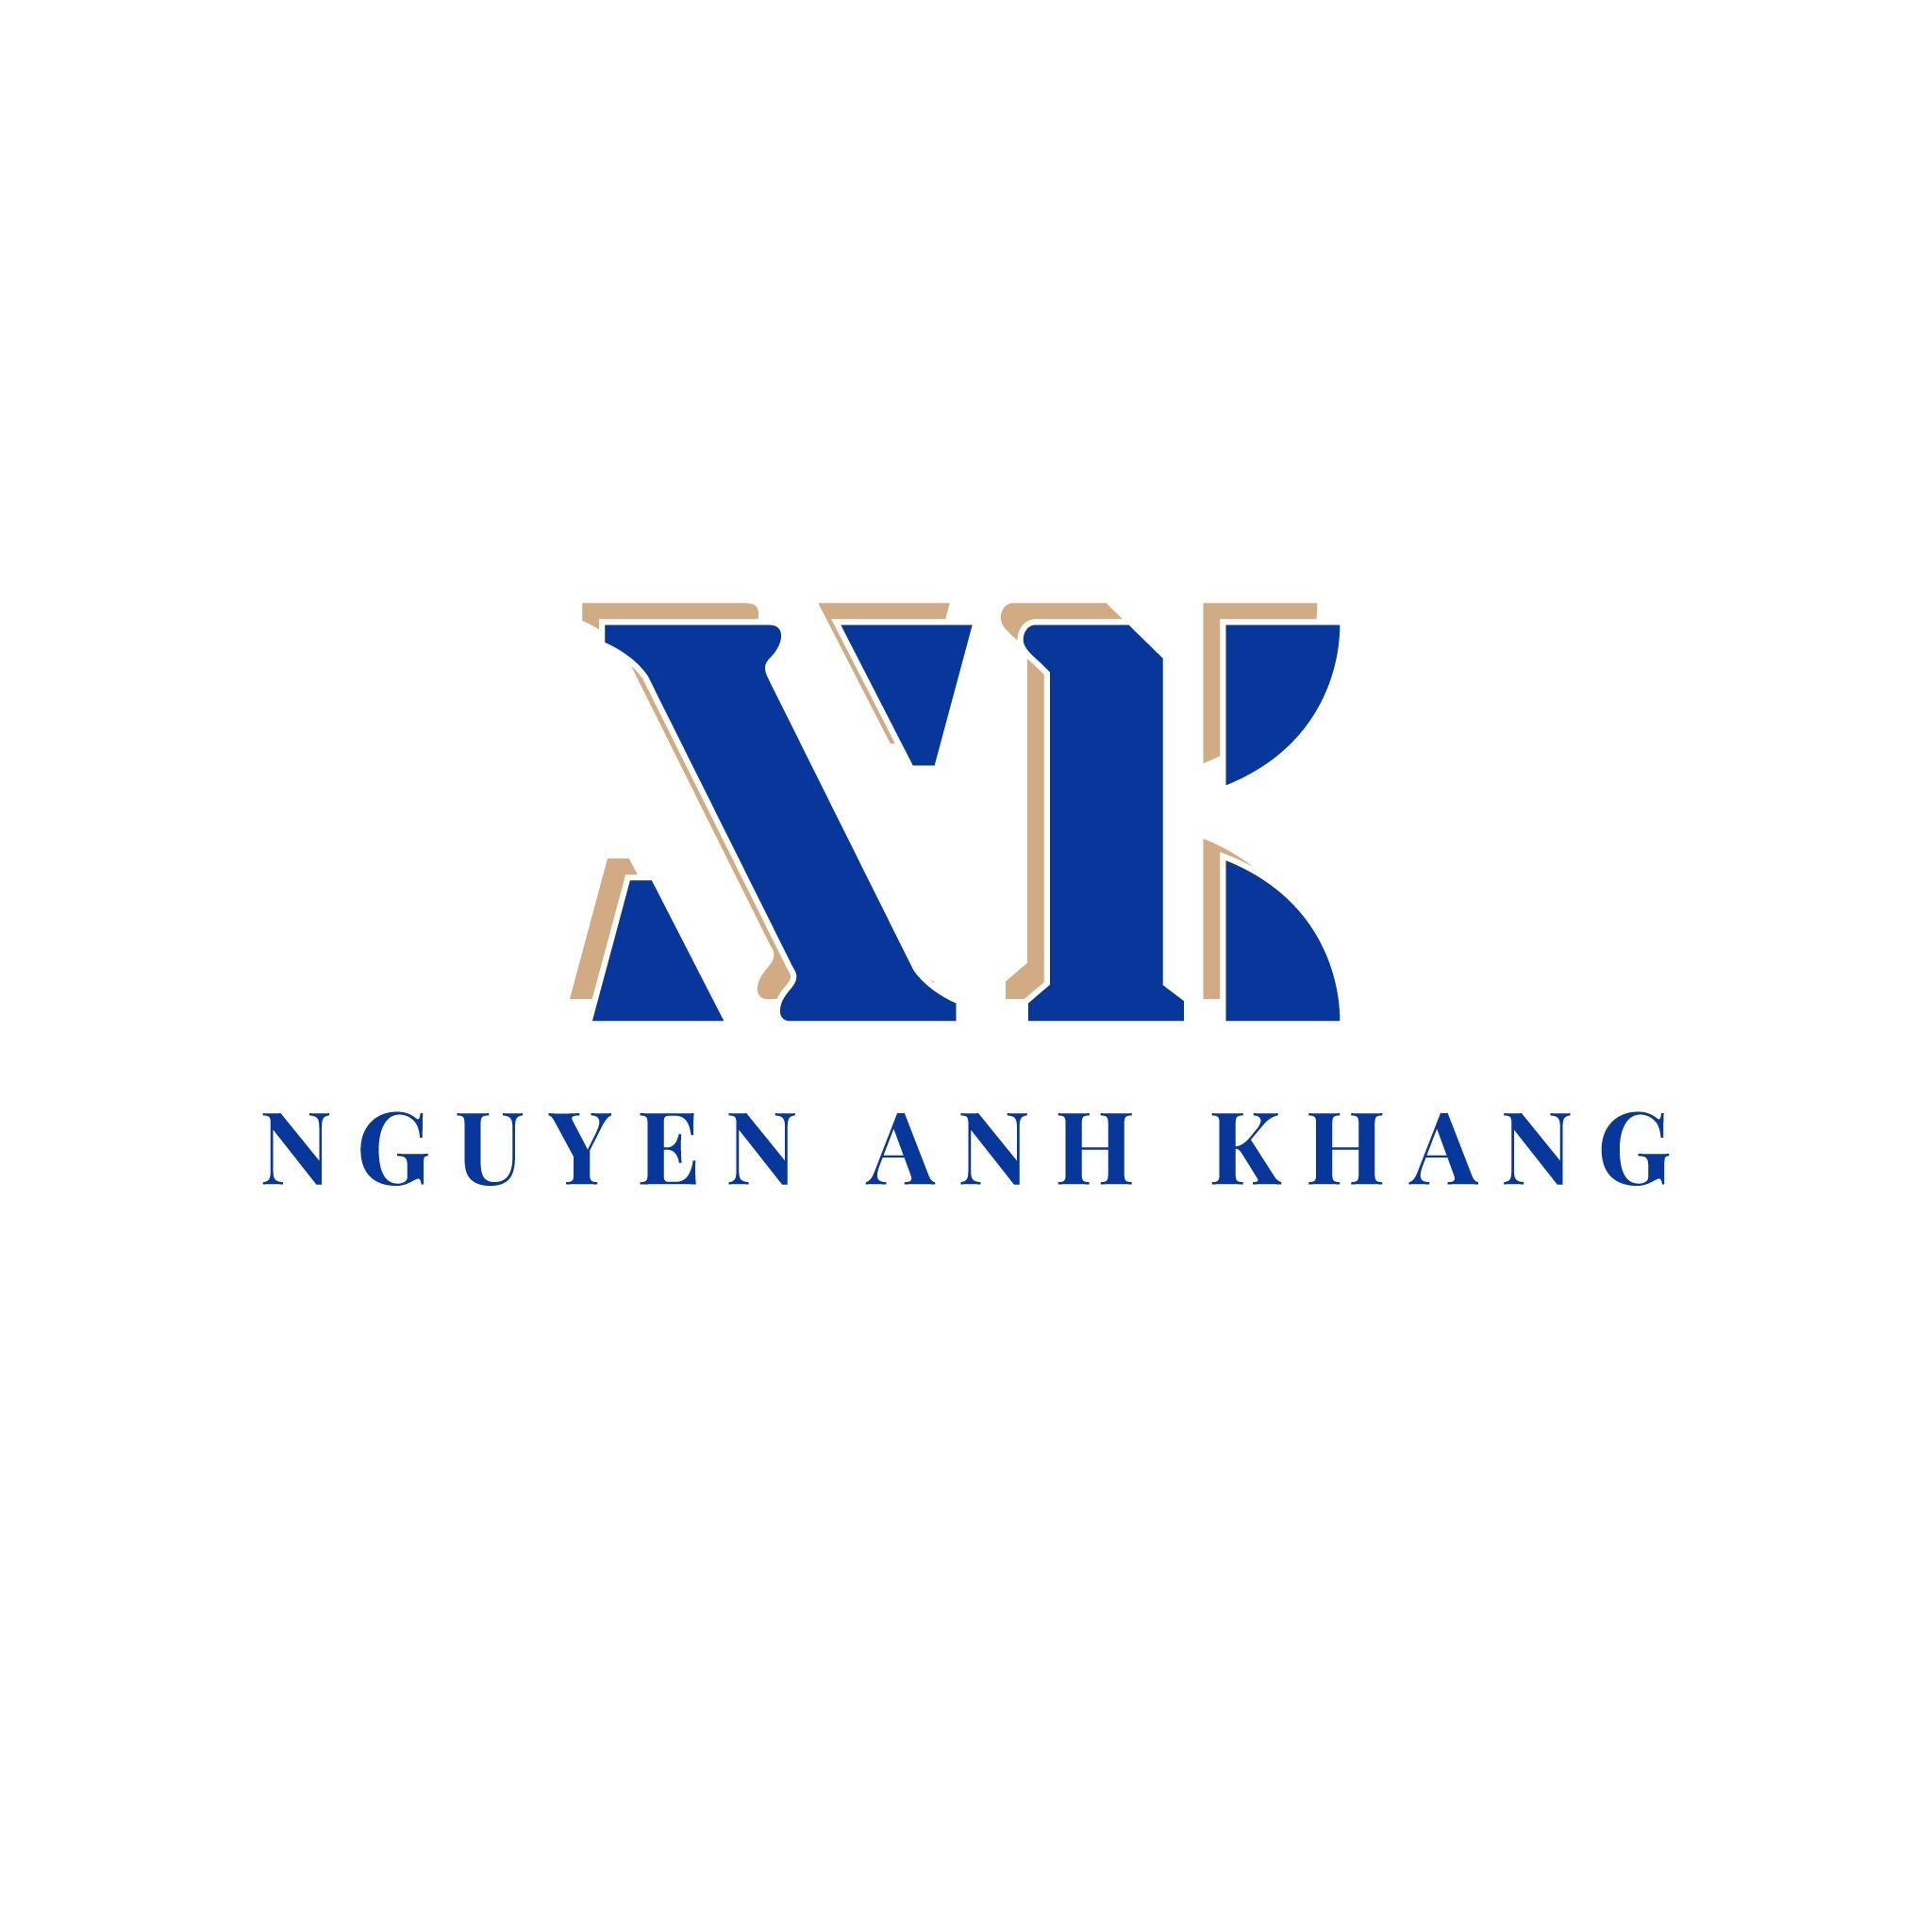 Avatar user Nguyễn Anh Khang